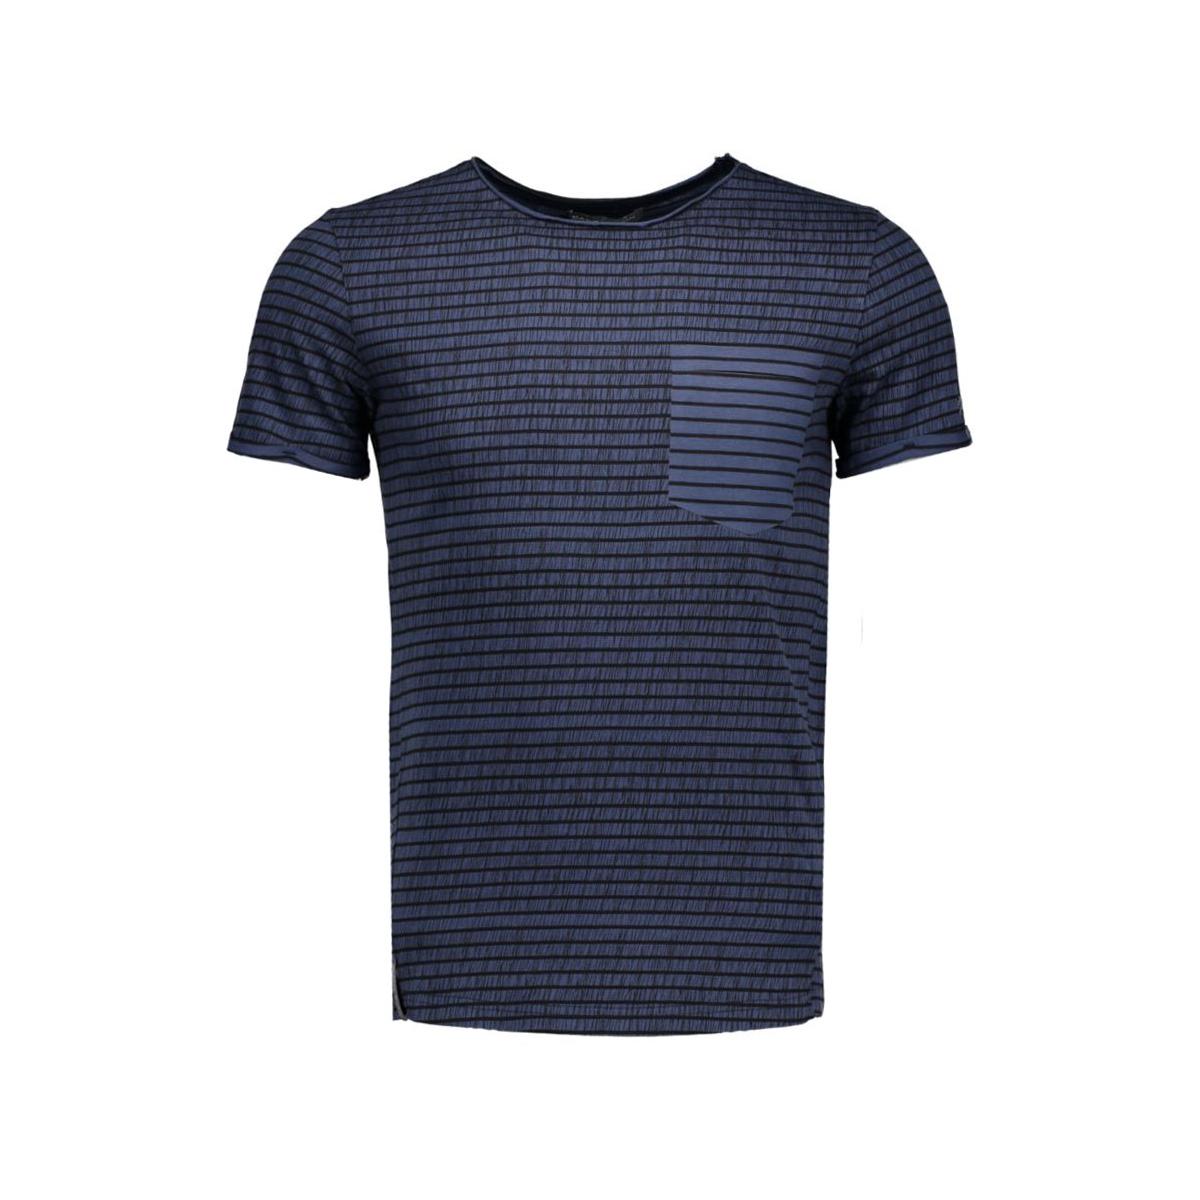 ctss63309 cast iron t-shirt 5203